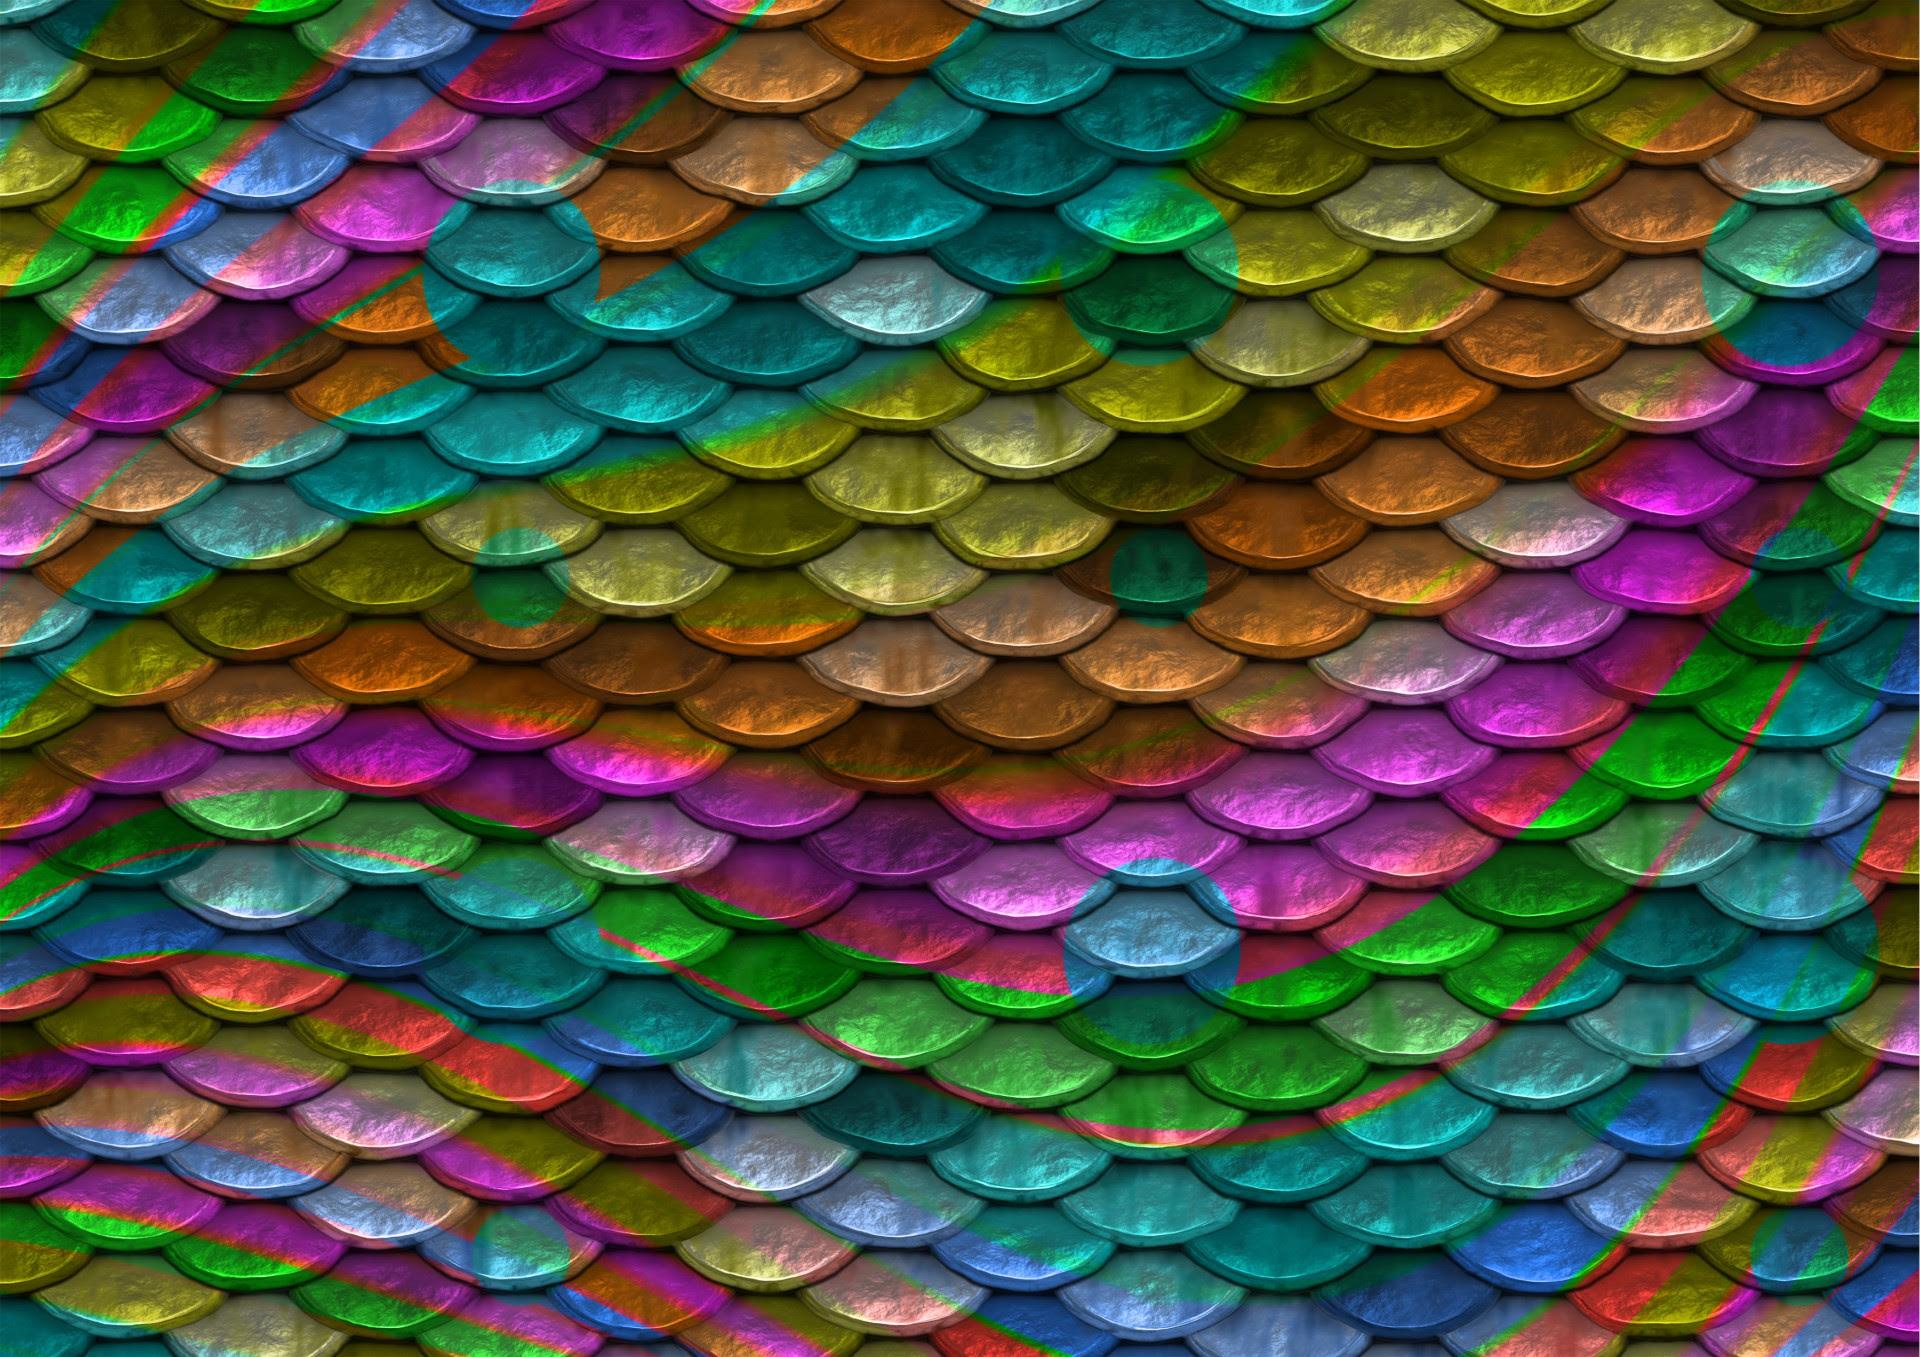 scales backround rainbow colors